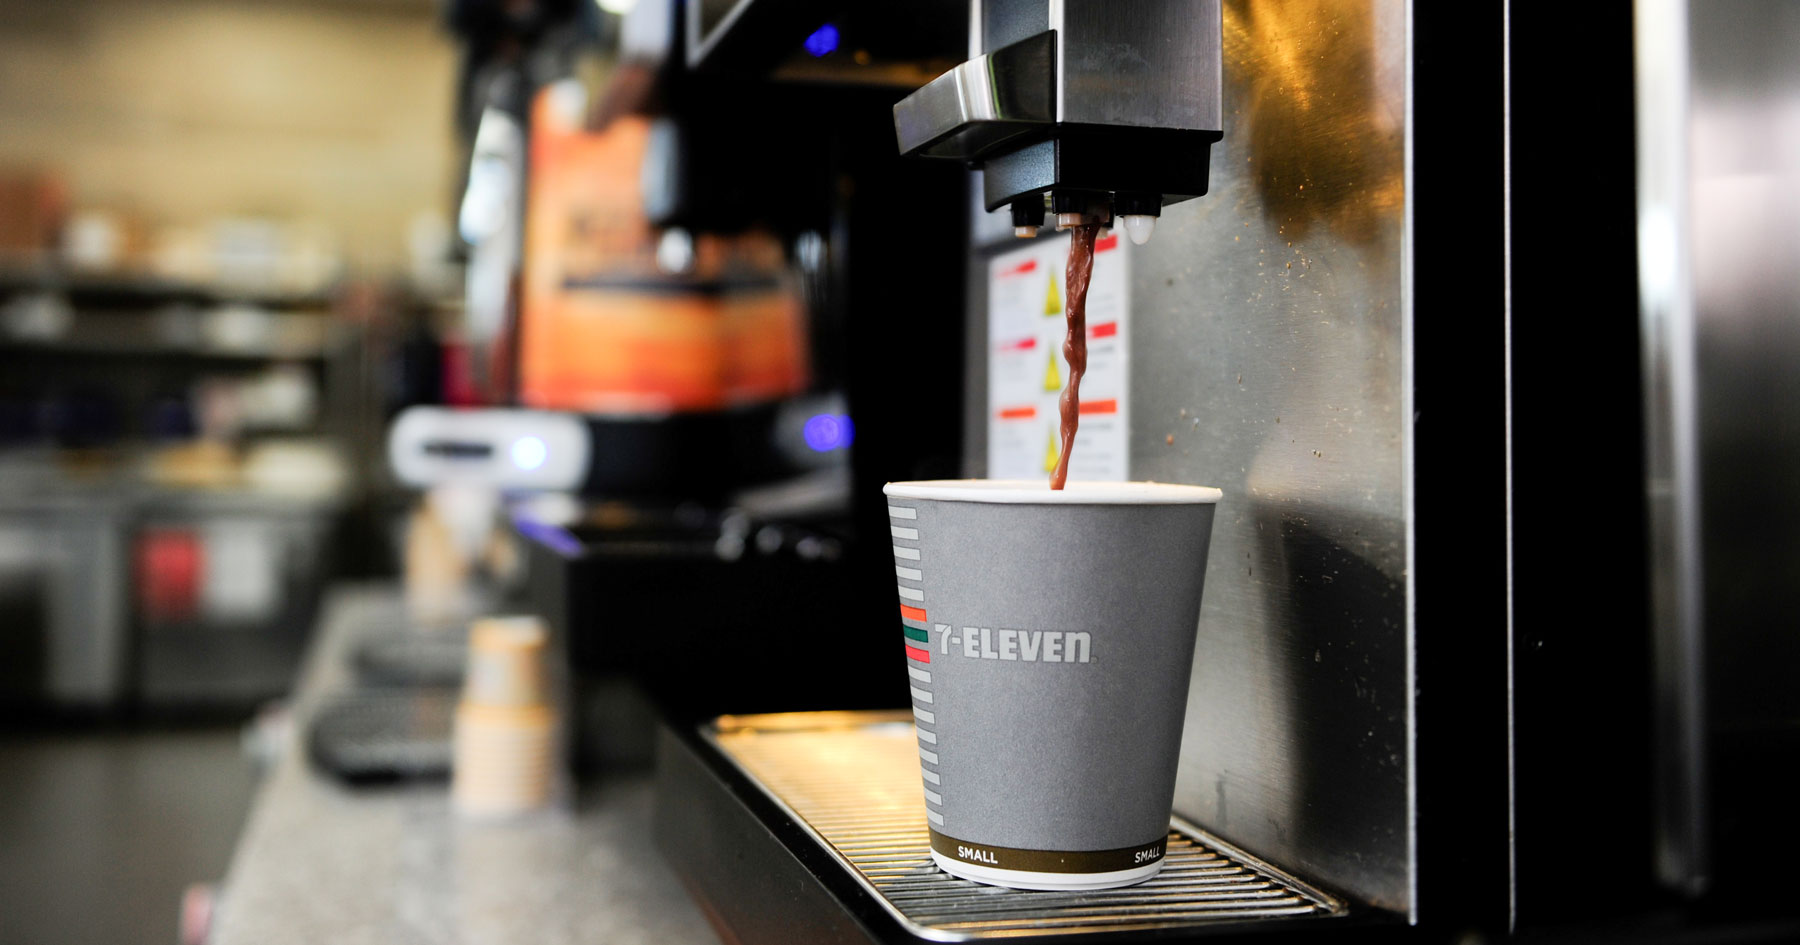 7 Eleven Introducing Beverage New Bars kPuwXZiOTl